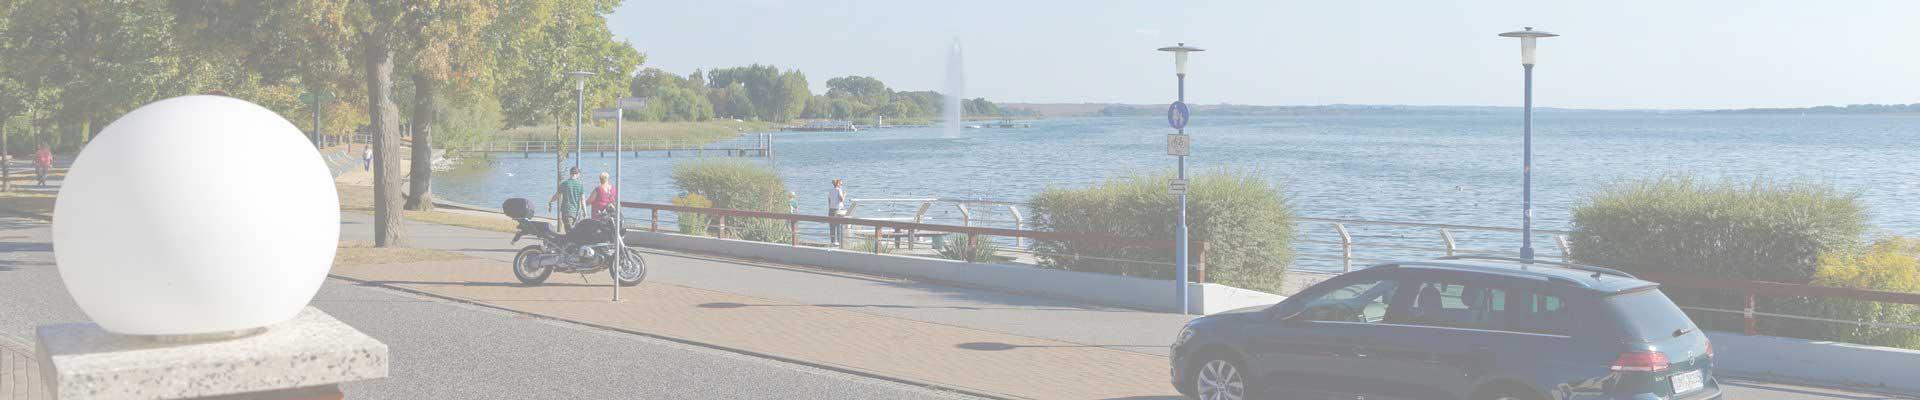 Promenade am Uckersee in Prenzlau